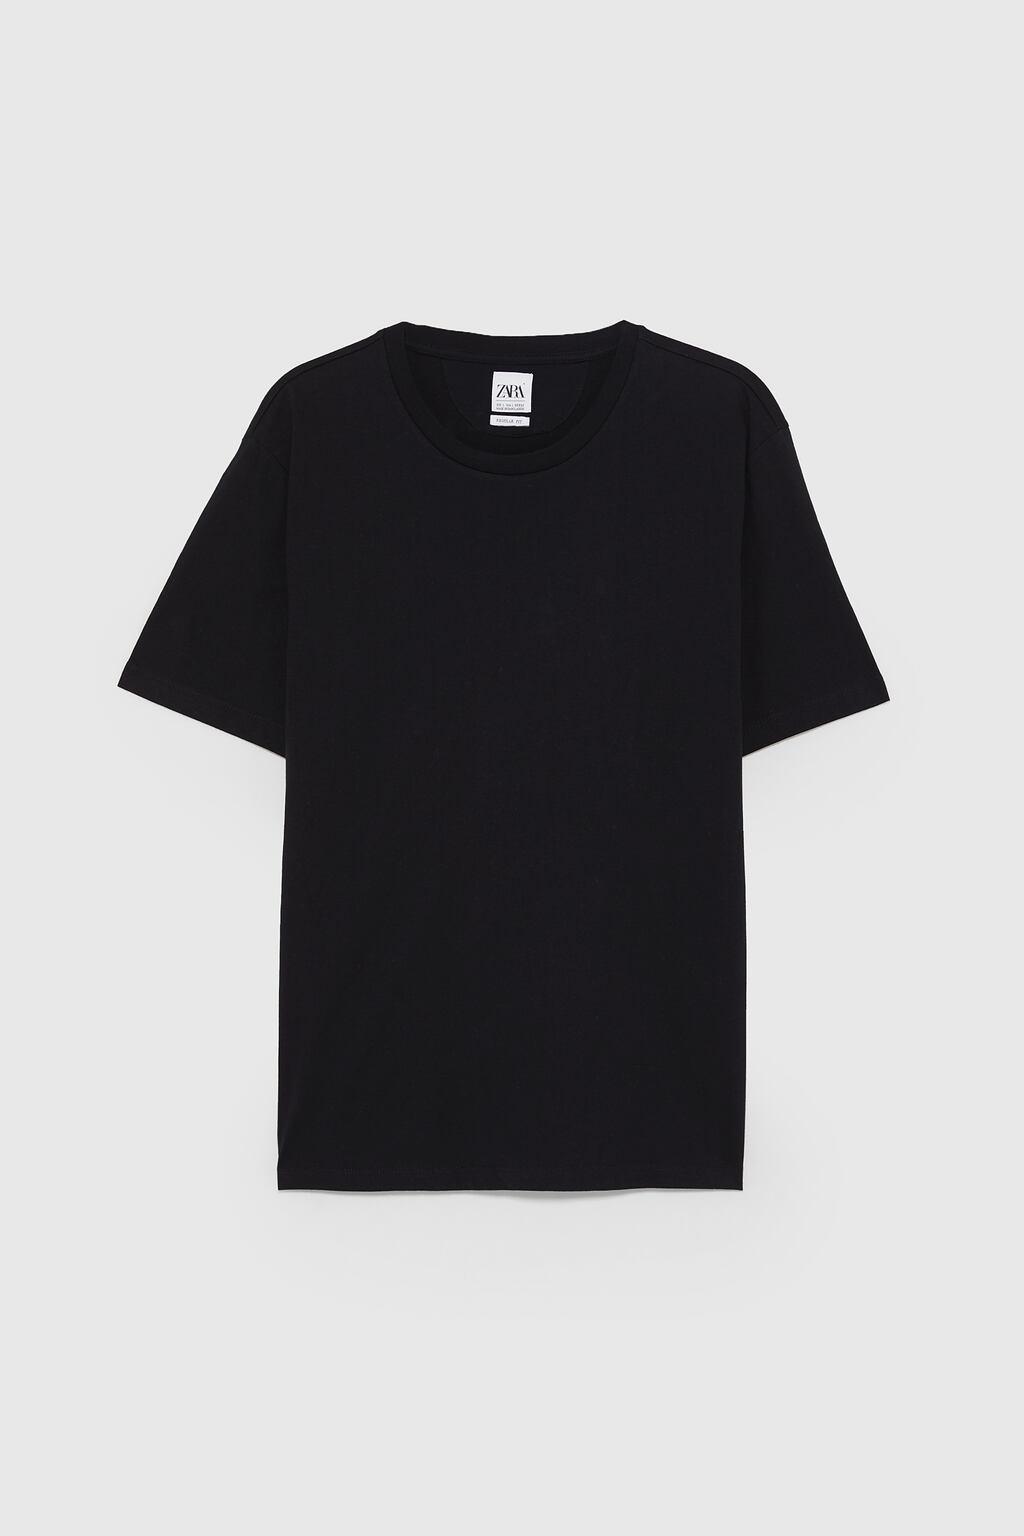 Black T-Shirt from zara.com